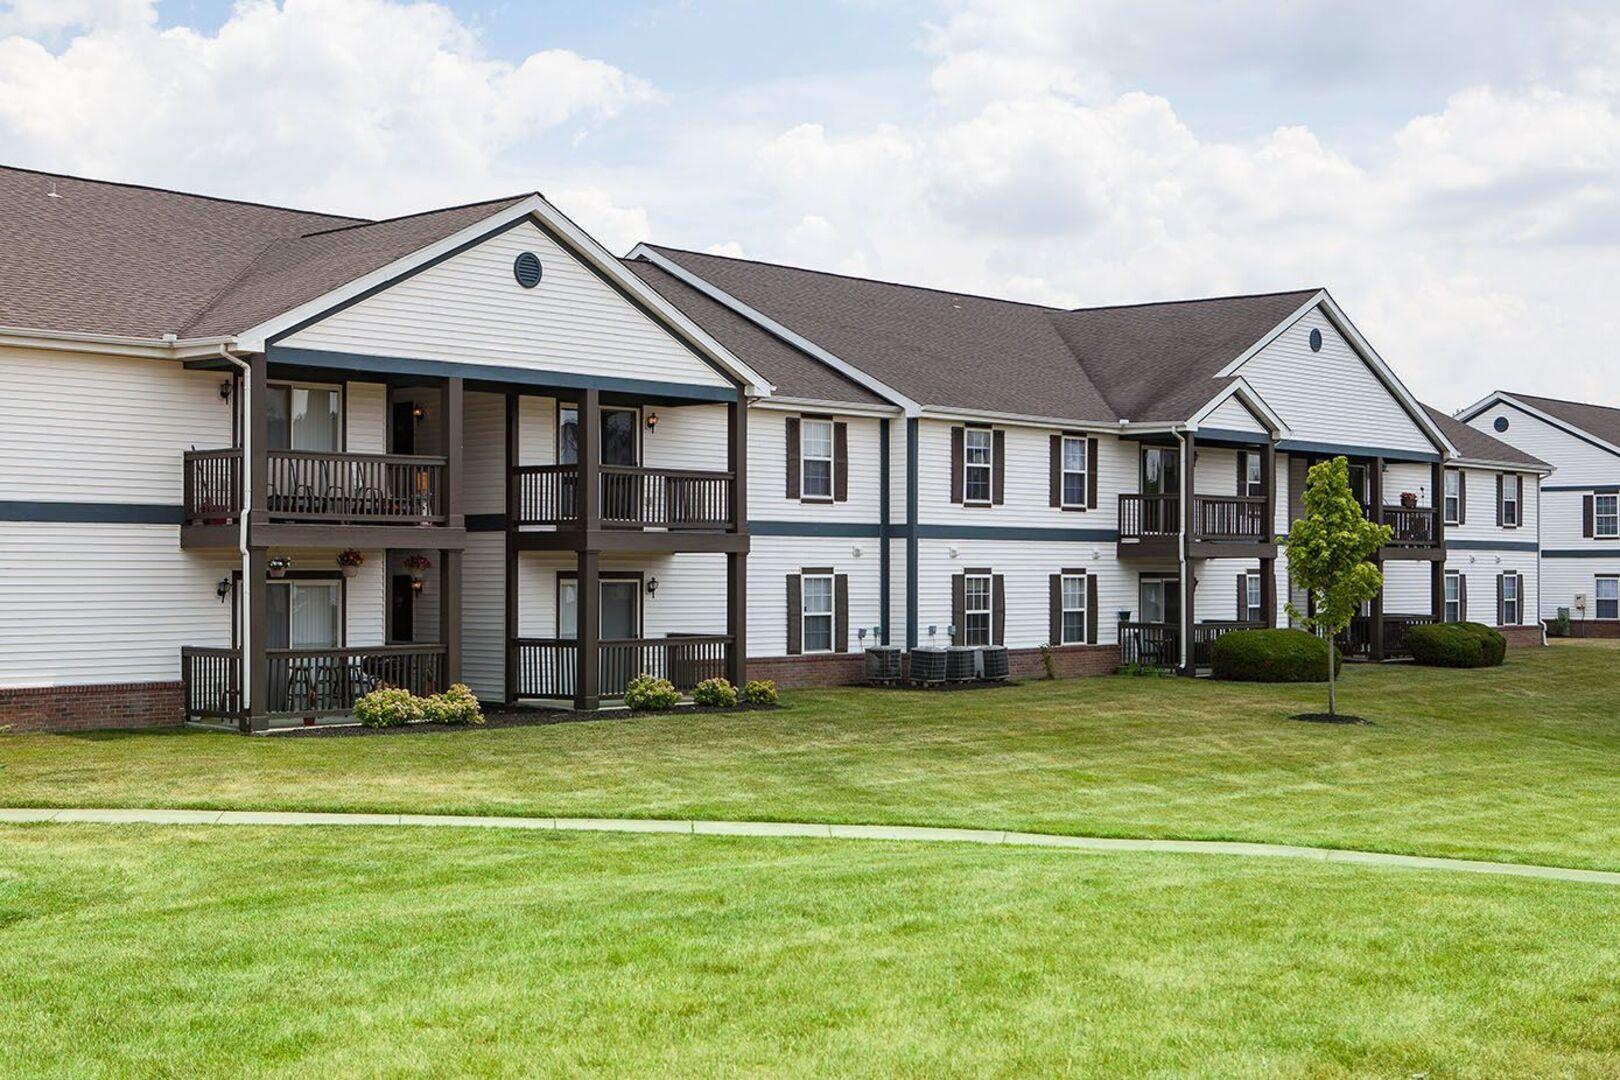 Jefferson Chase  Apartments in Blacklick Ohio